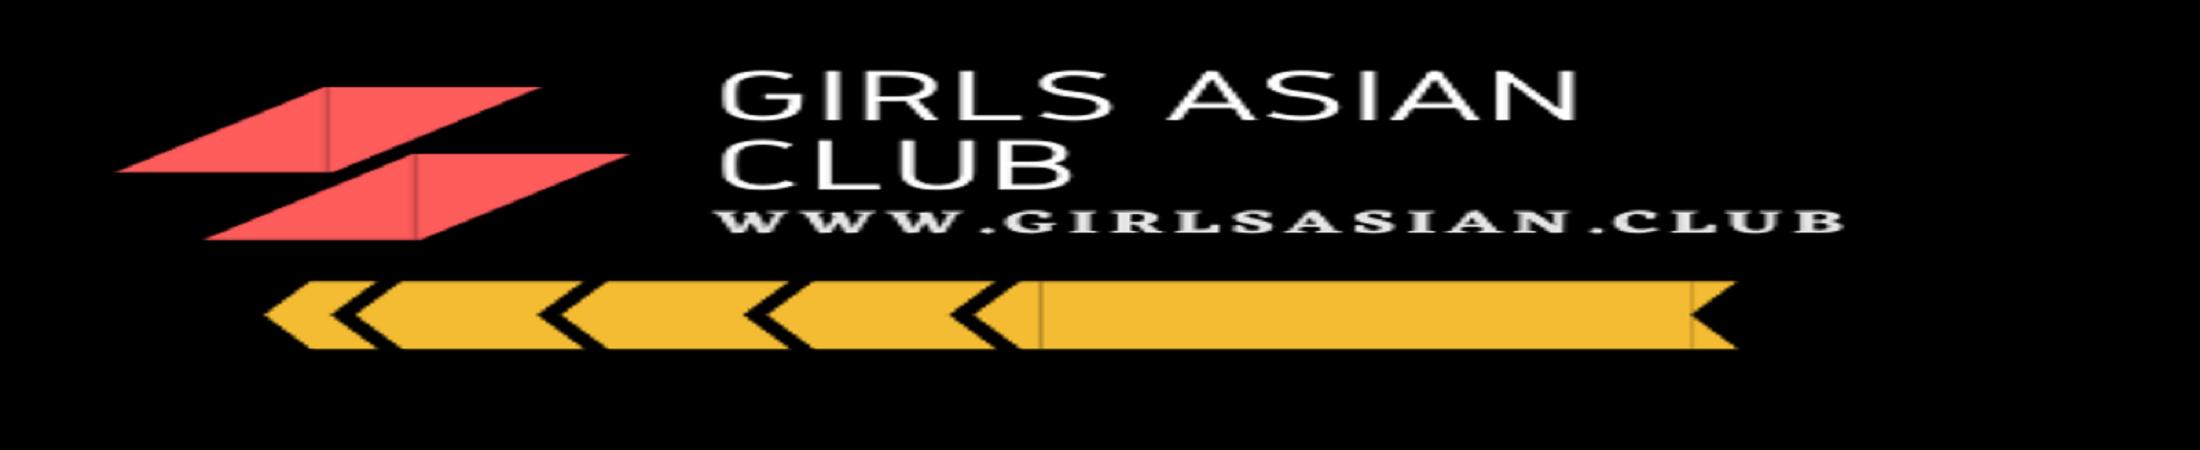 Girls Asian Club